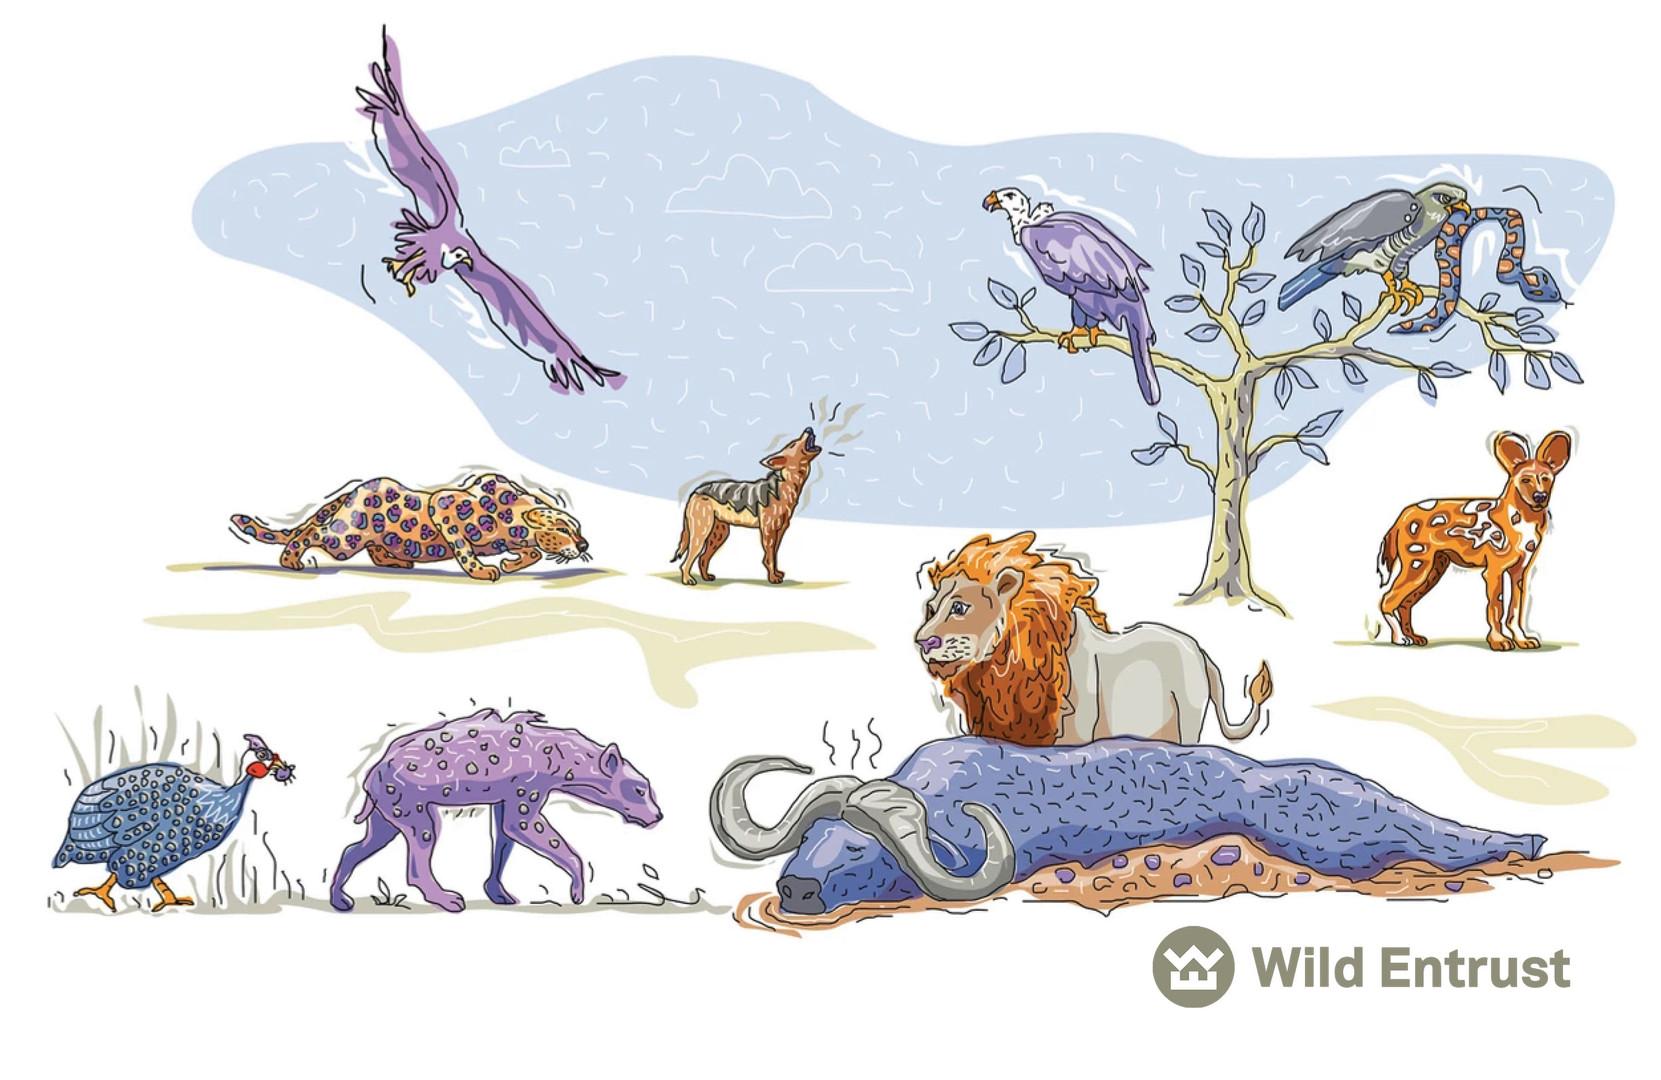 CHARLES BONGERS AFRICAN LION WILD ENTRUST